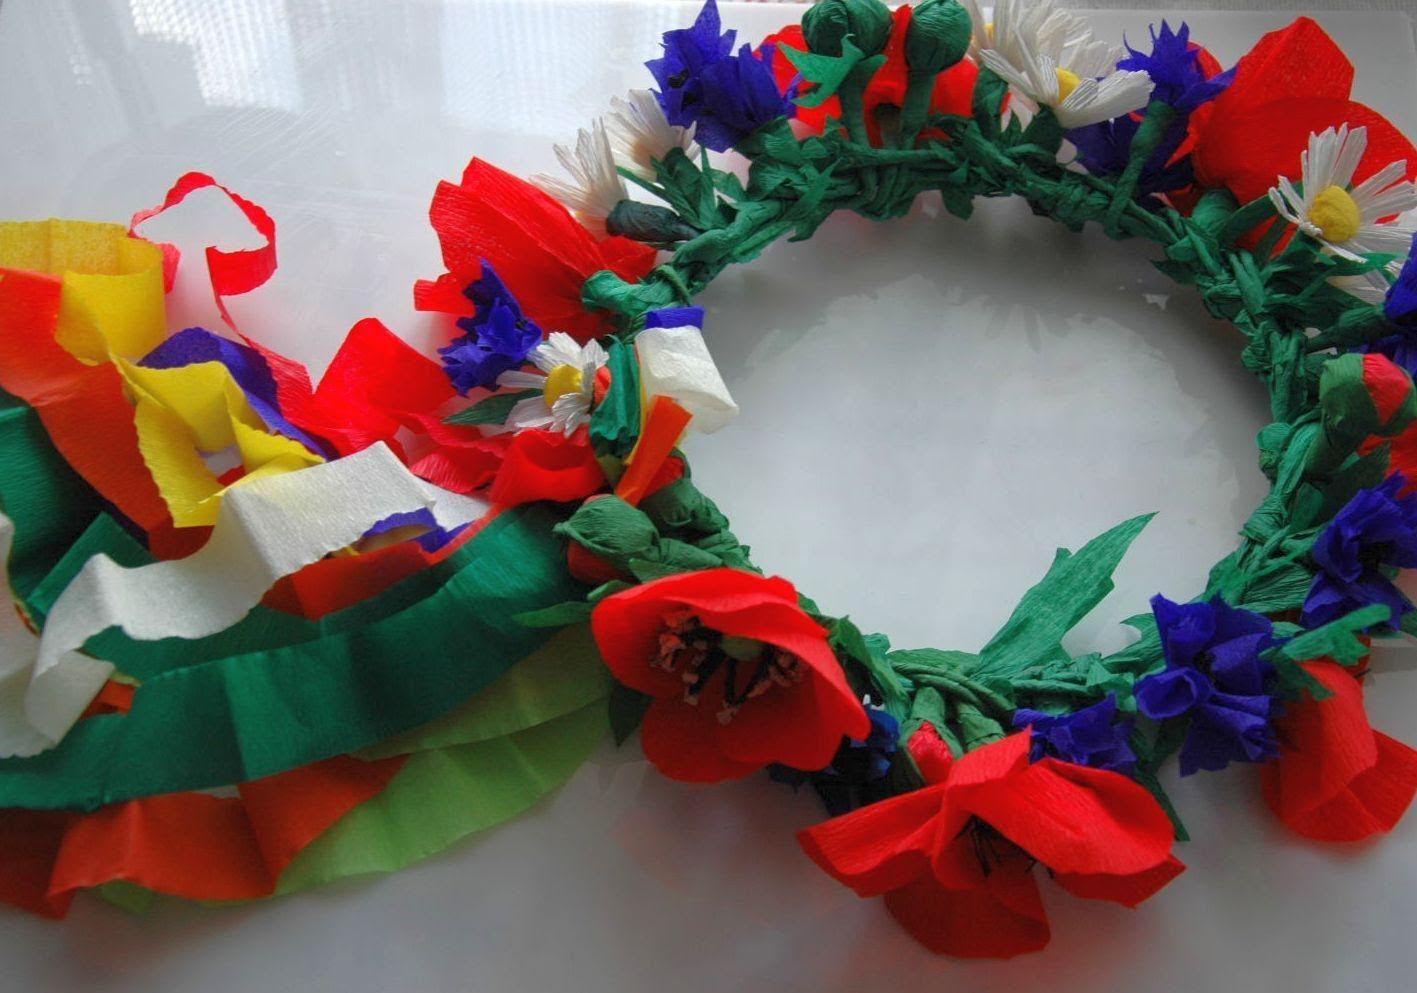 Wianek Z Kwiatow Na Glowe Flower Wreath Diy Arts And Crafts For Kids Crafts For Kids Crafts